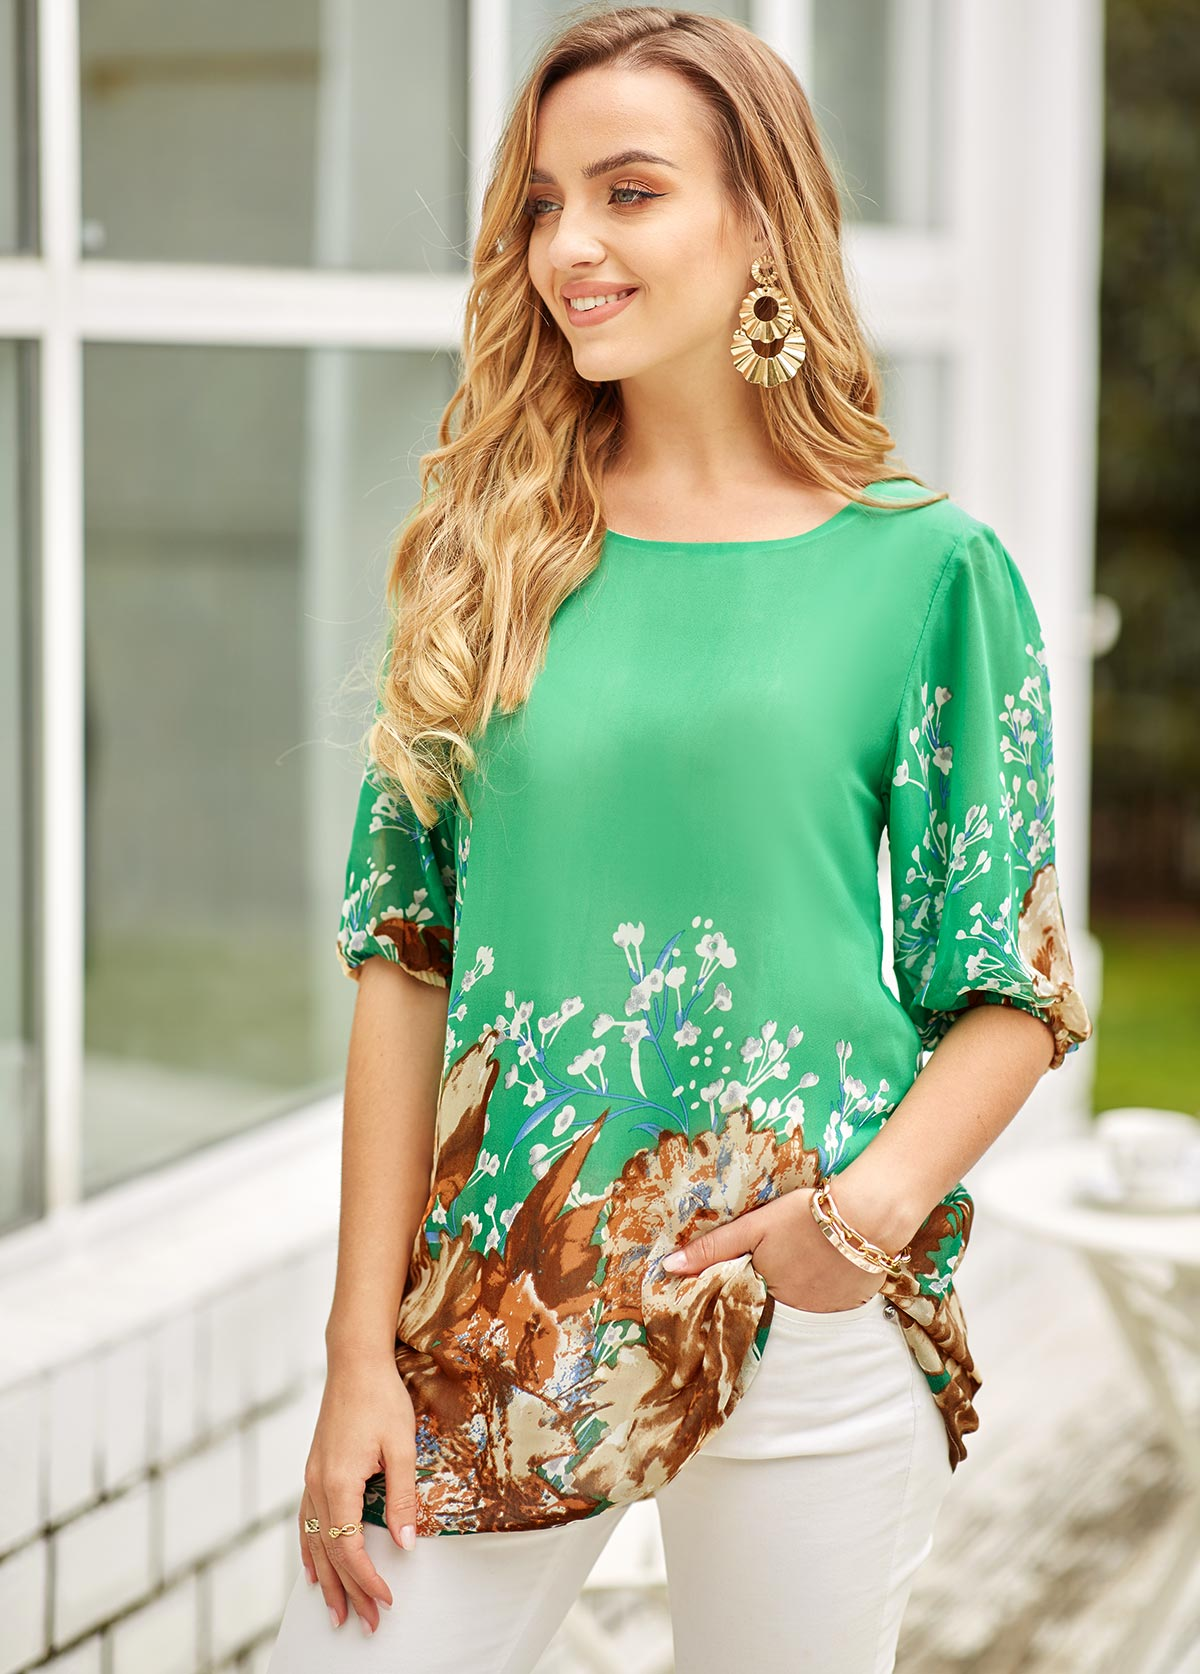 Blouson Sleeve Floral Print Round Neck T Shirt